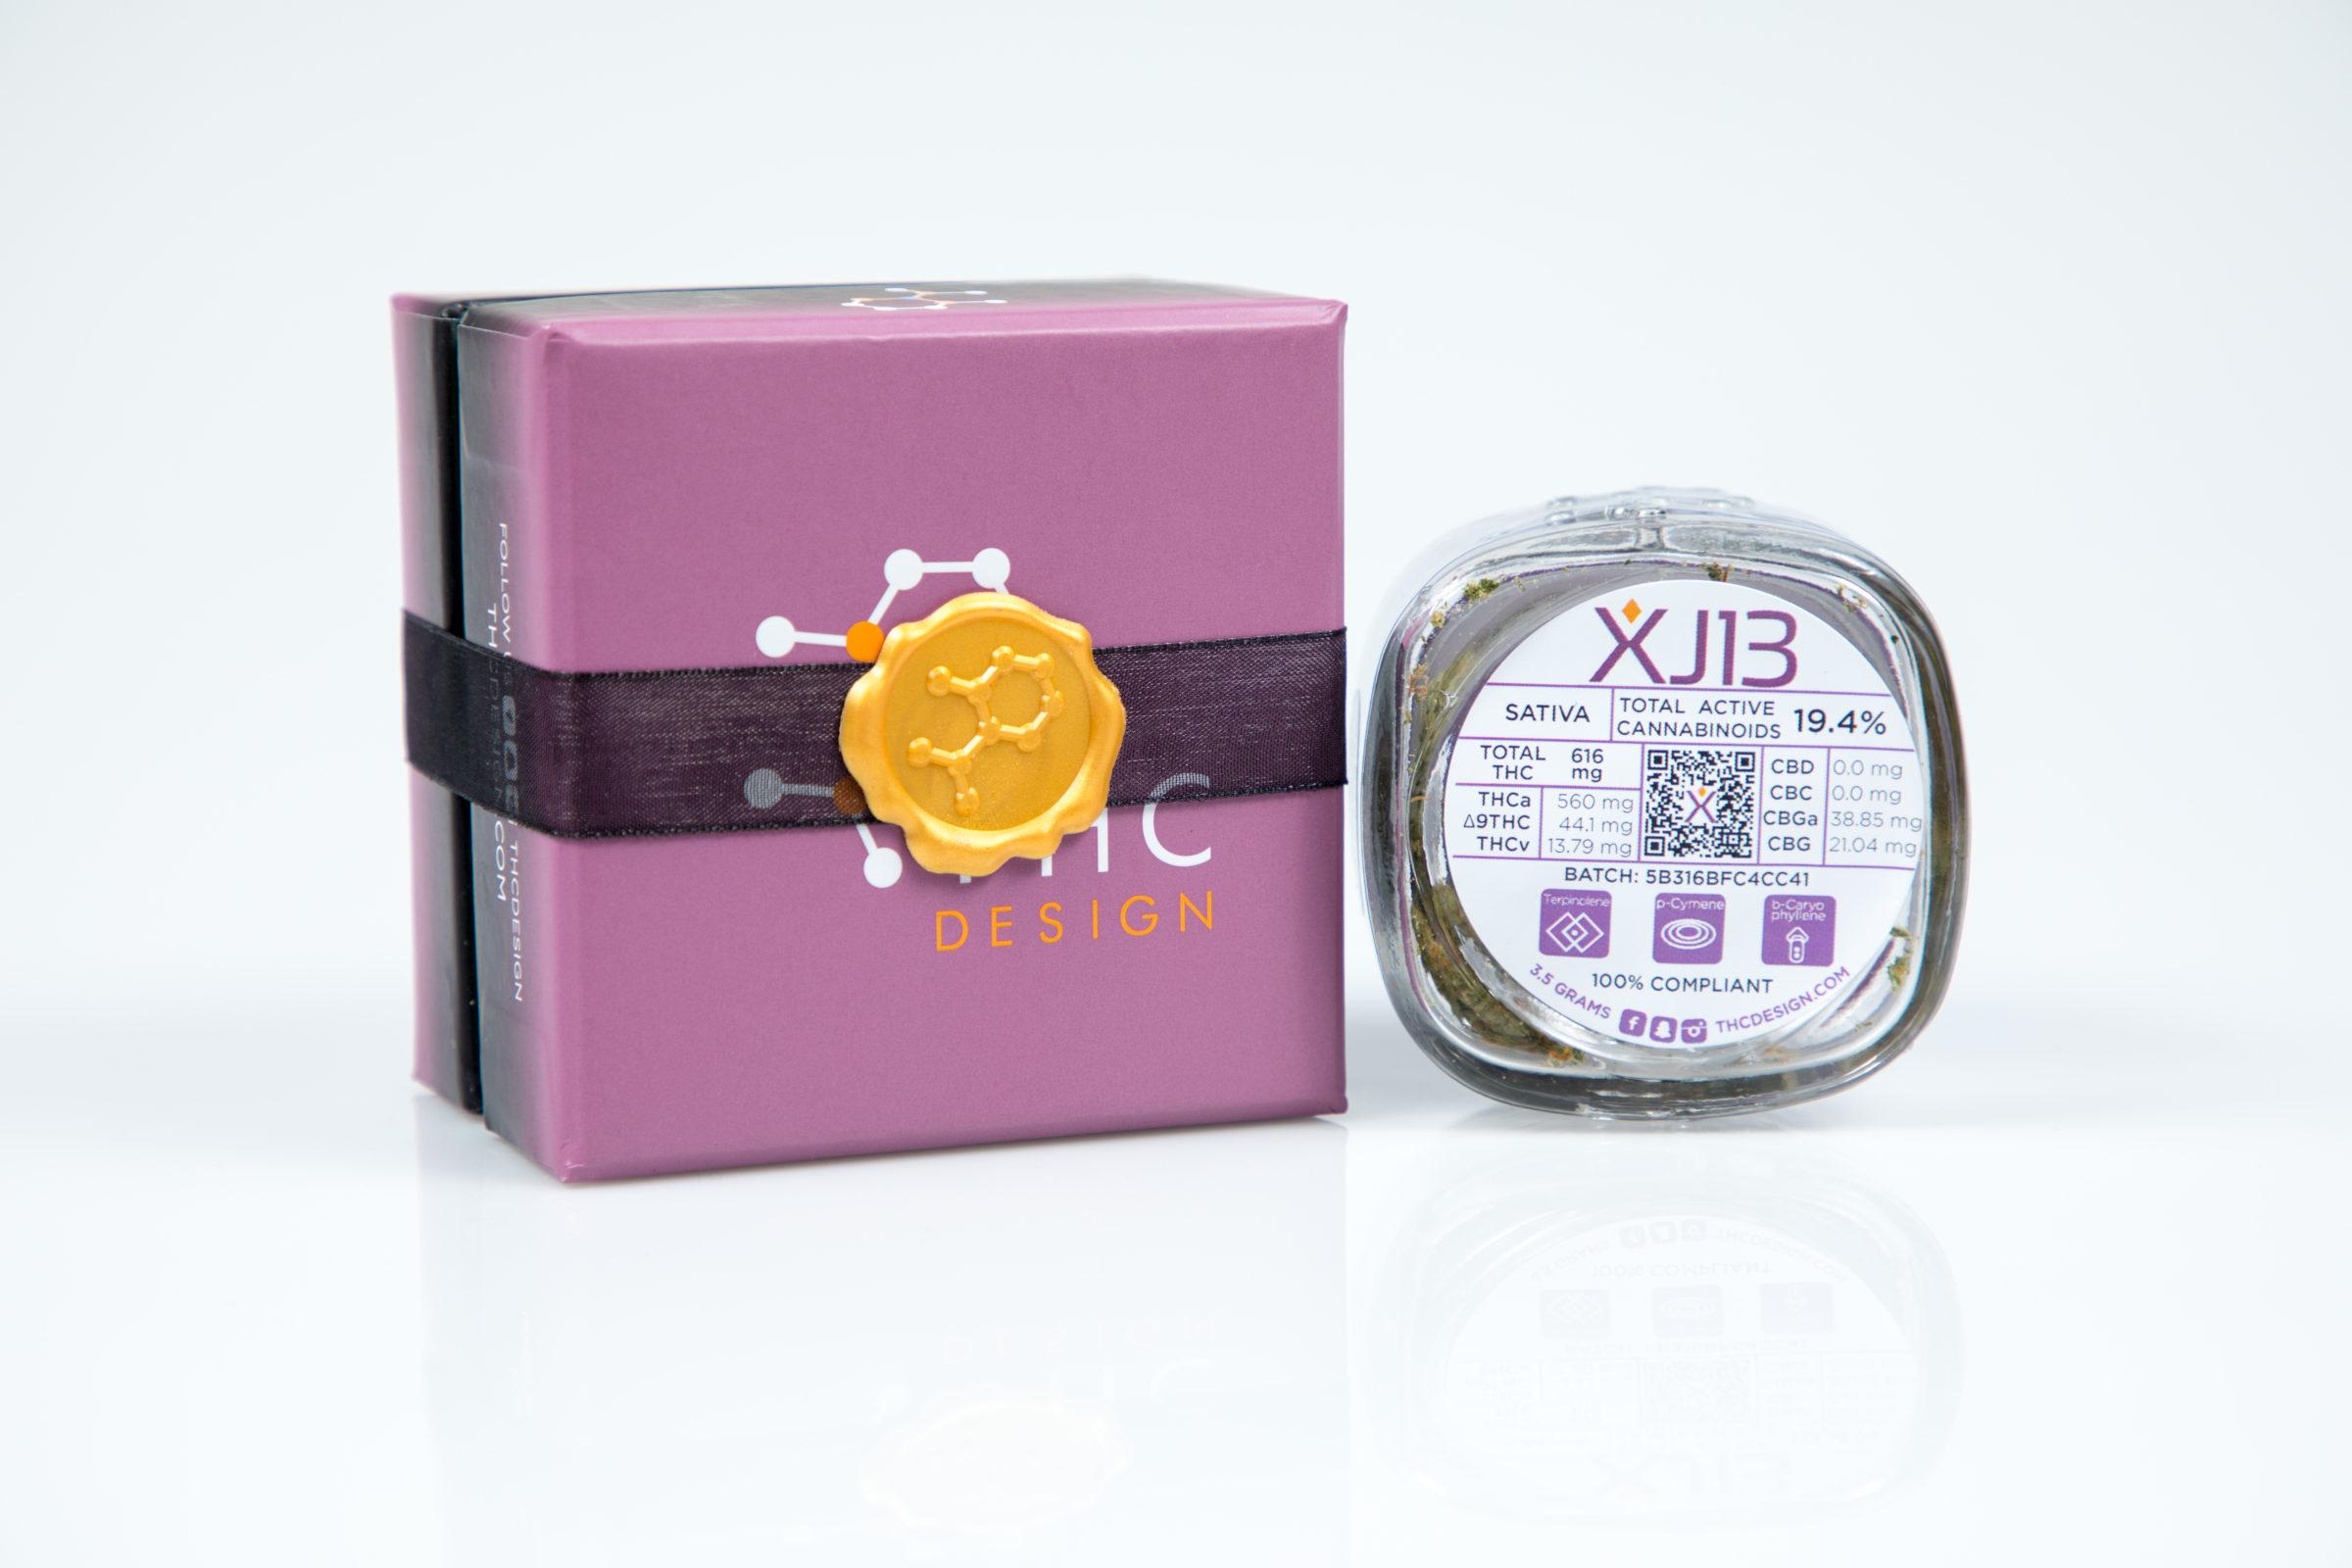 XJ13 growers reseve box-0250